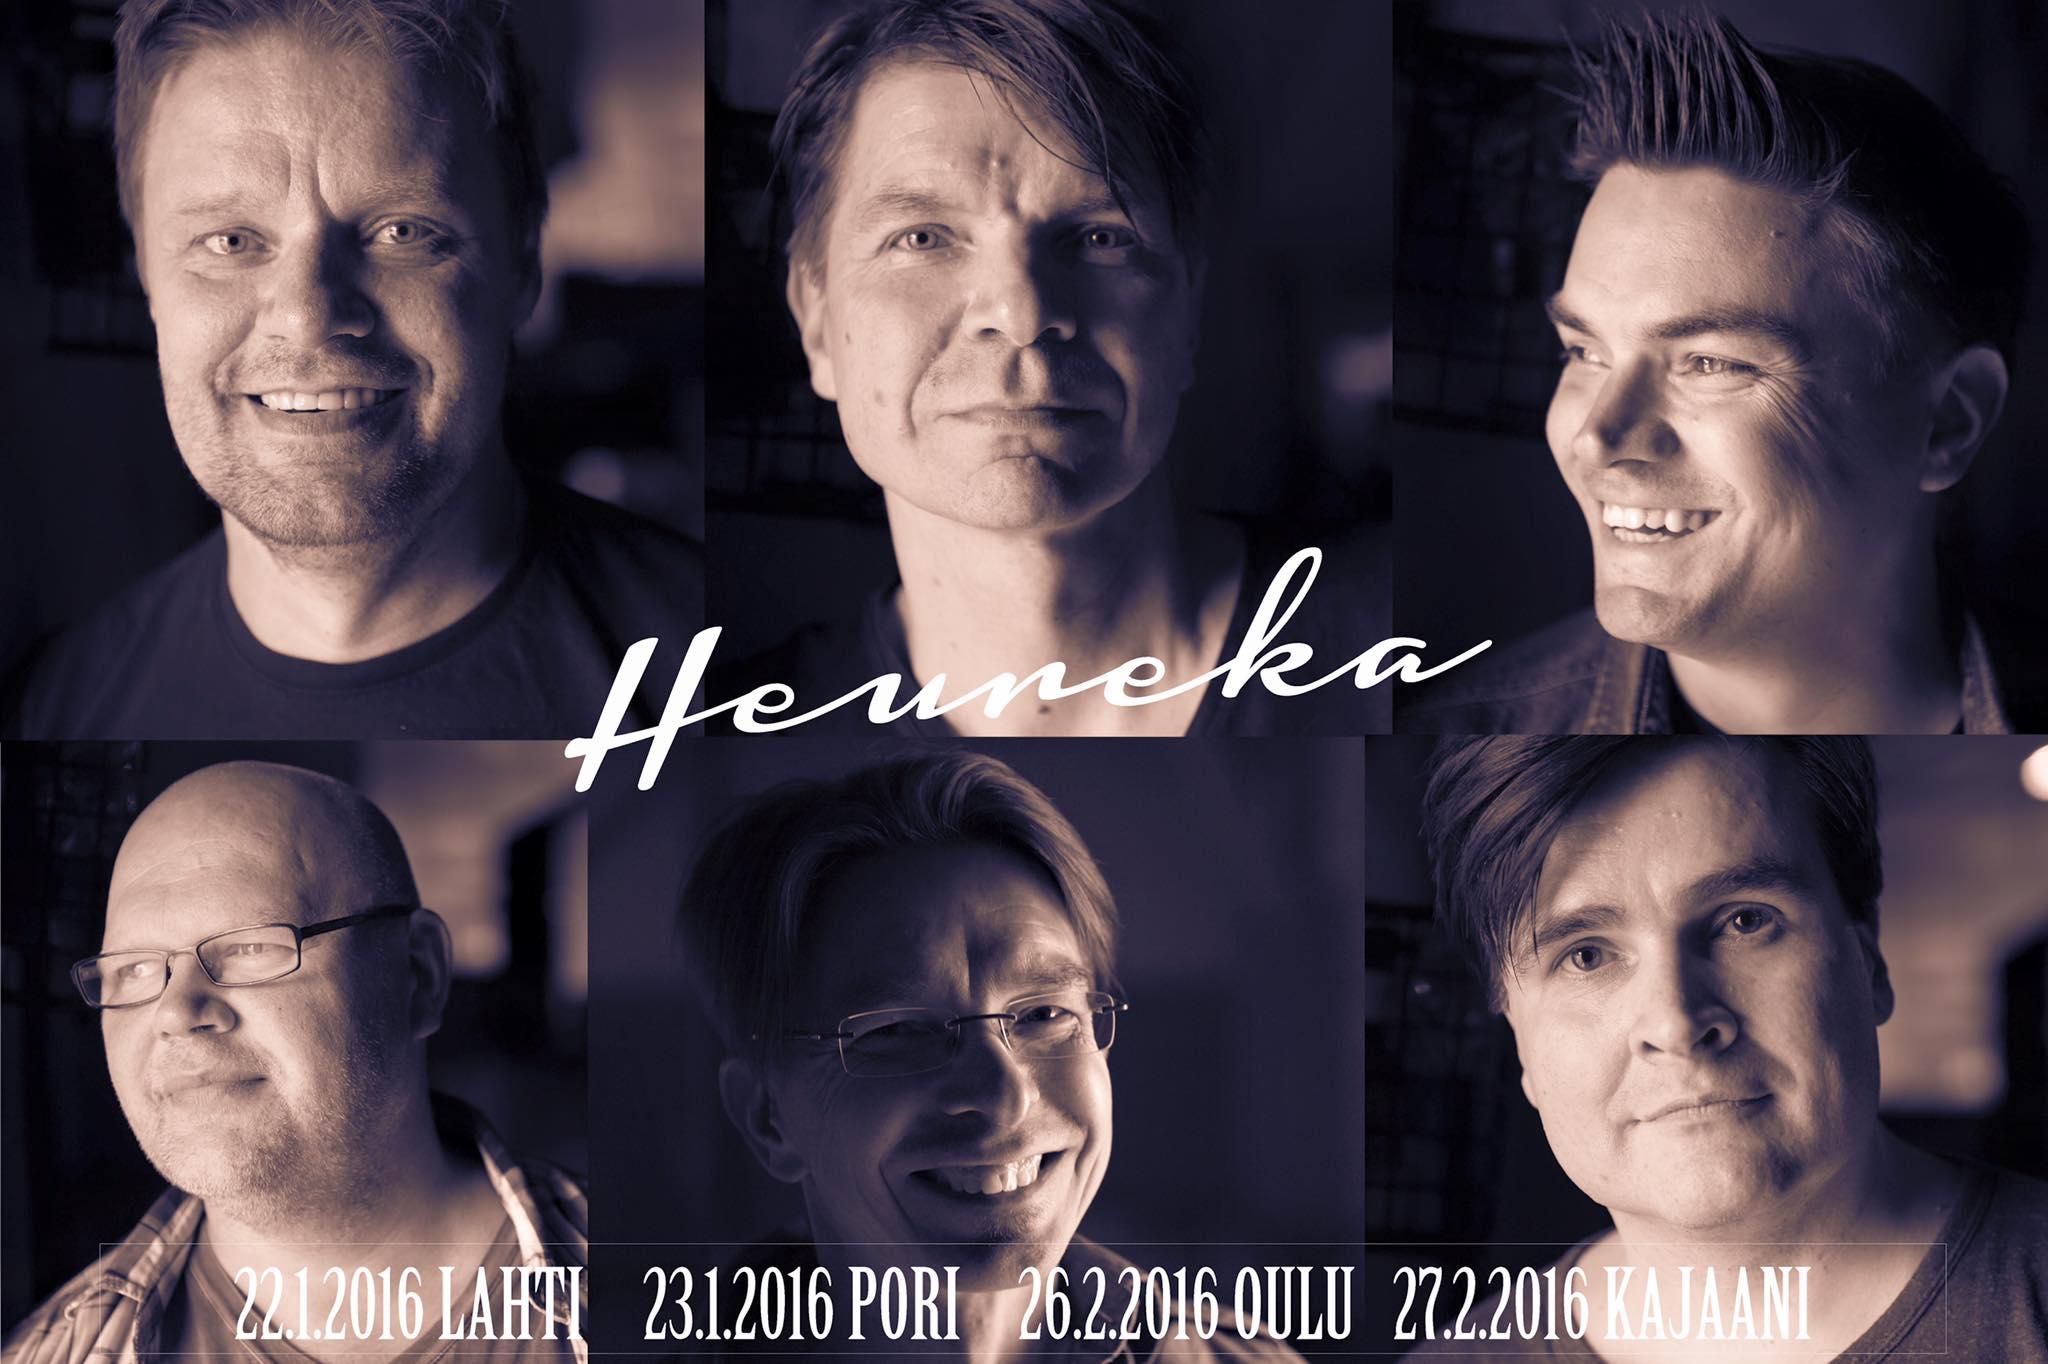 Heureka2016